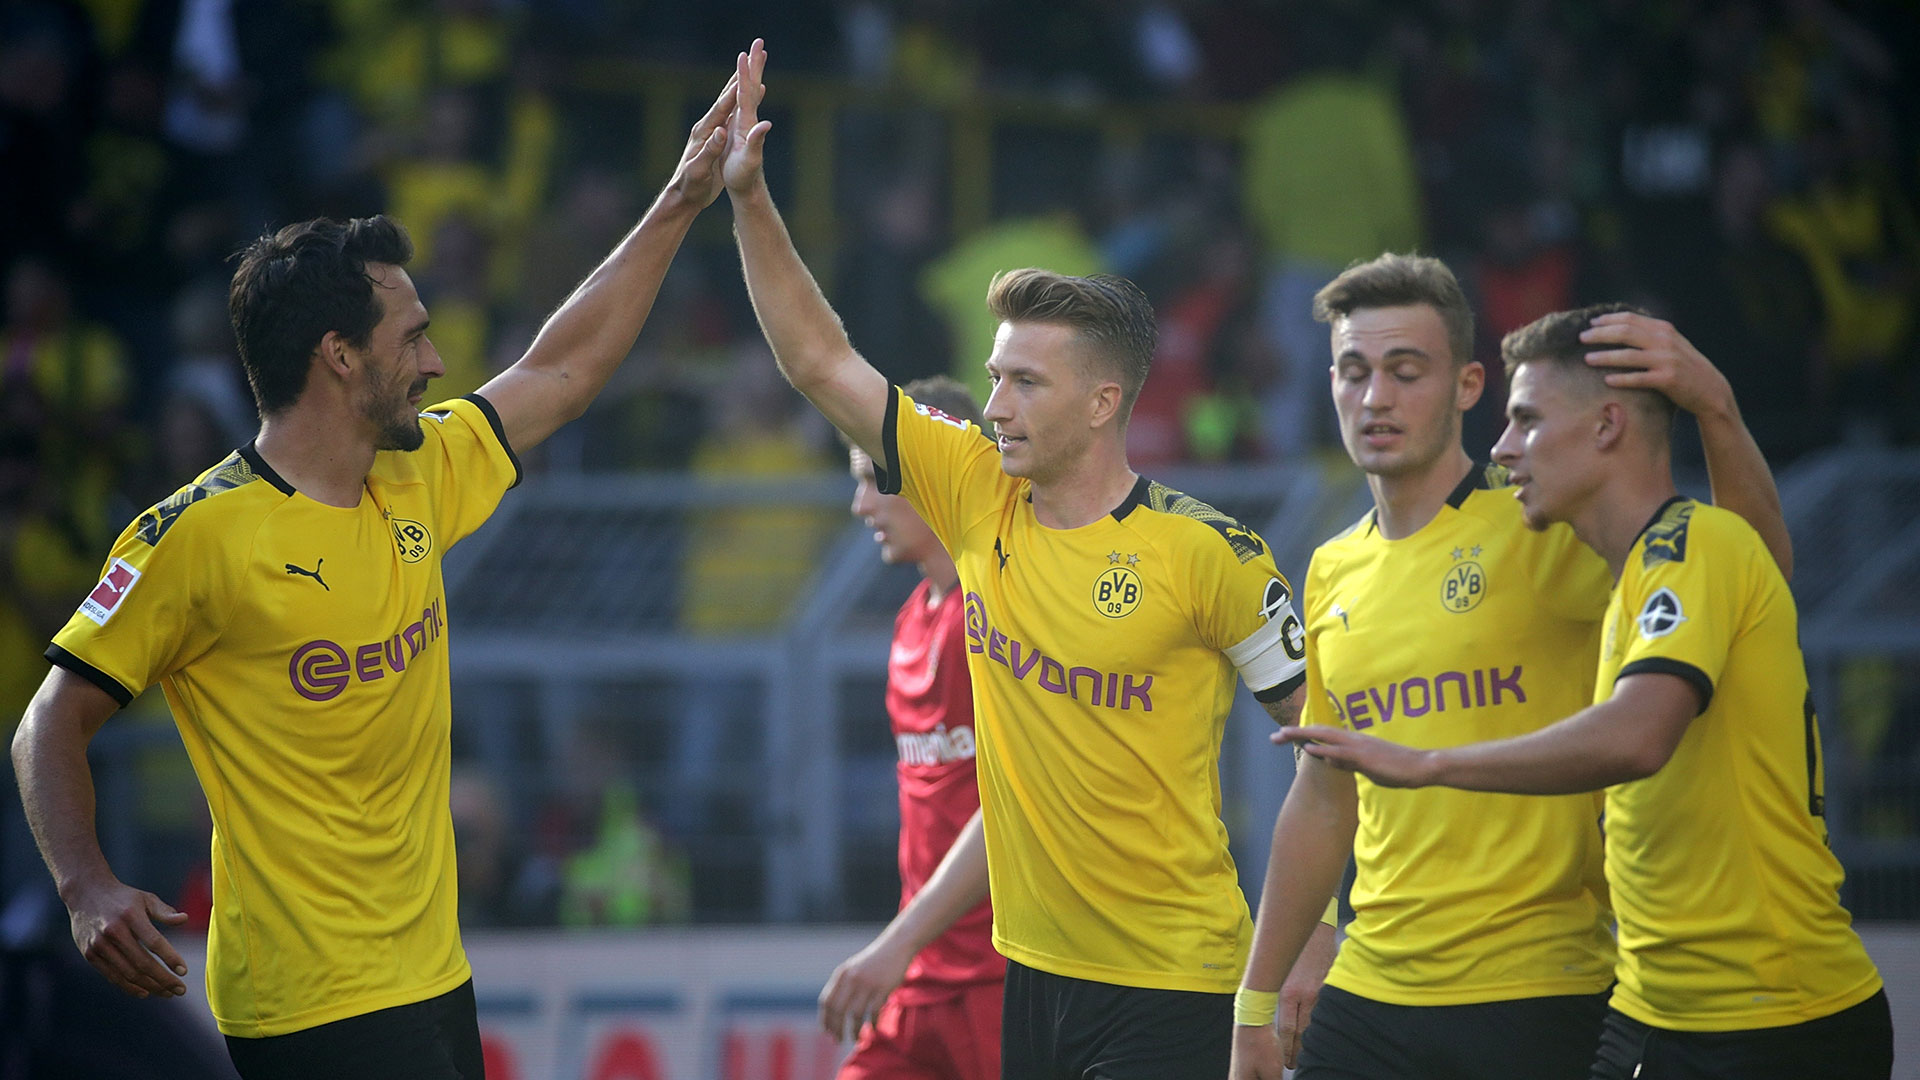 Dortmund Goal Celebration v Leverkusen 09152019